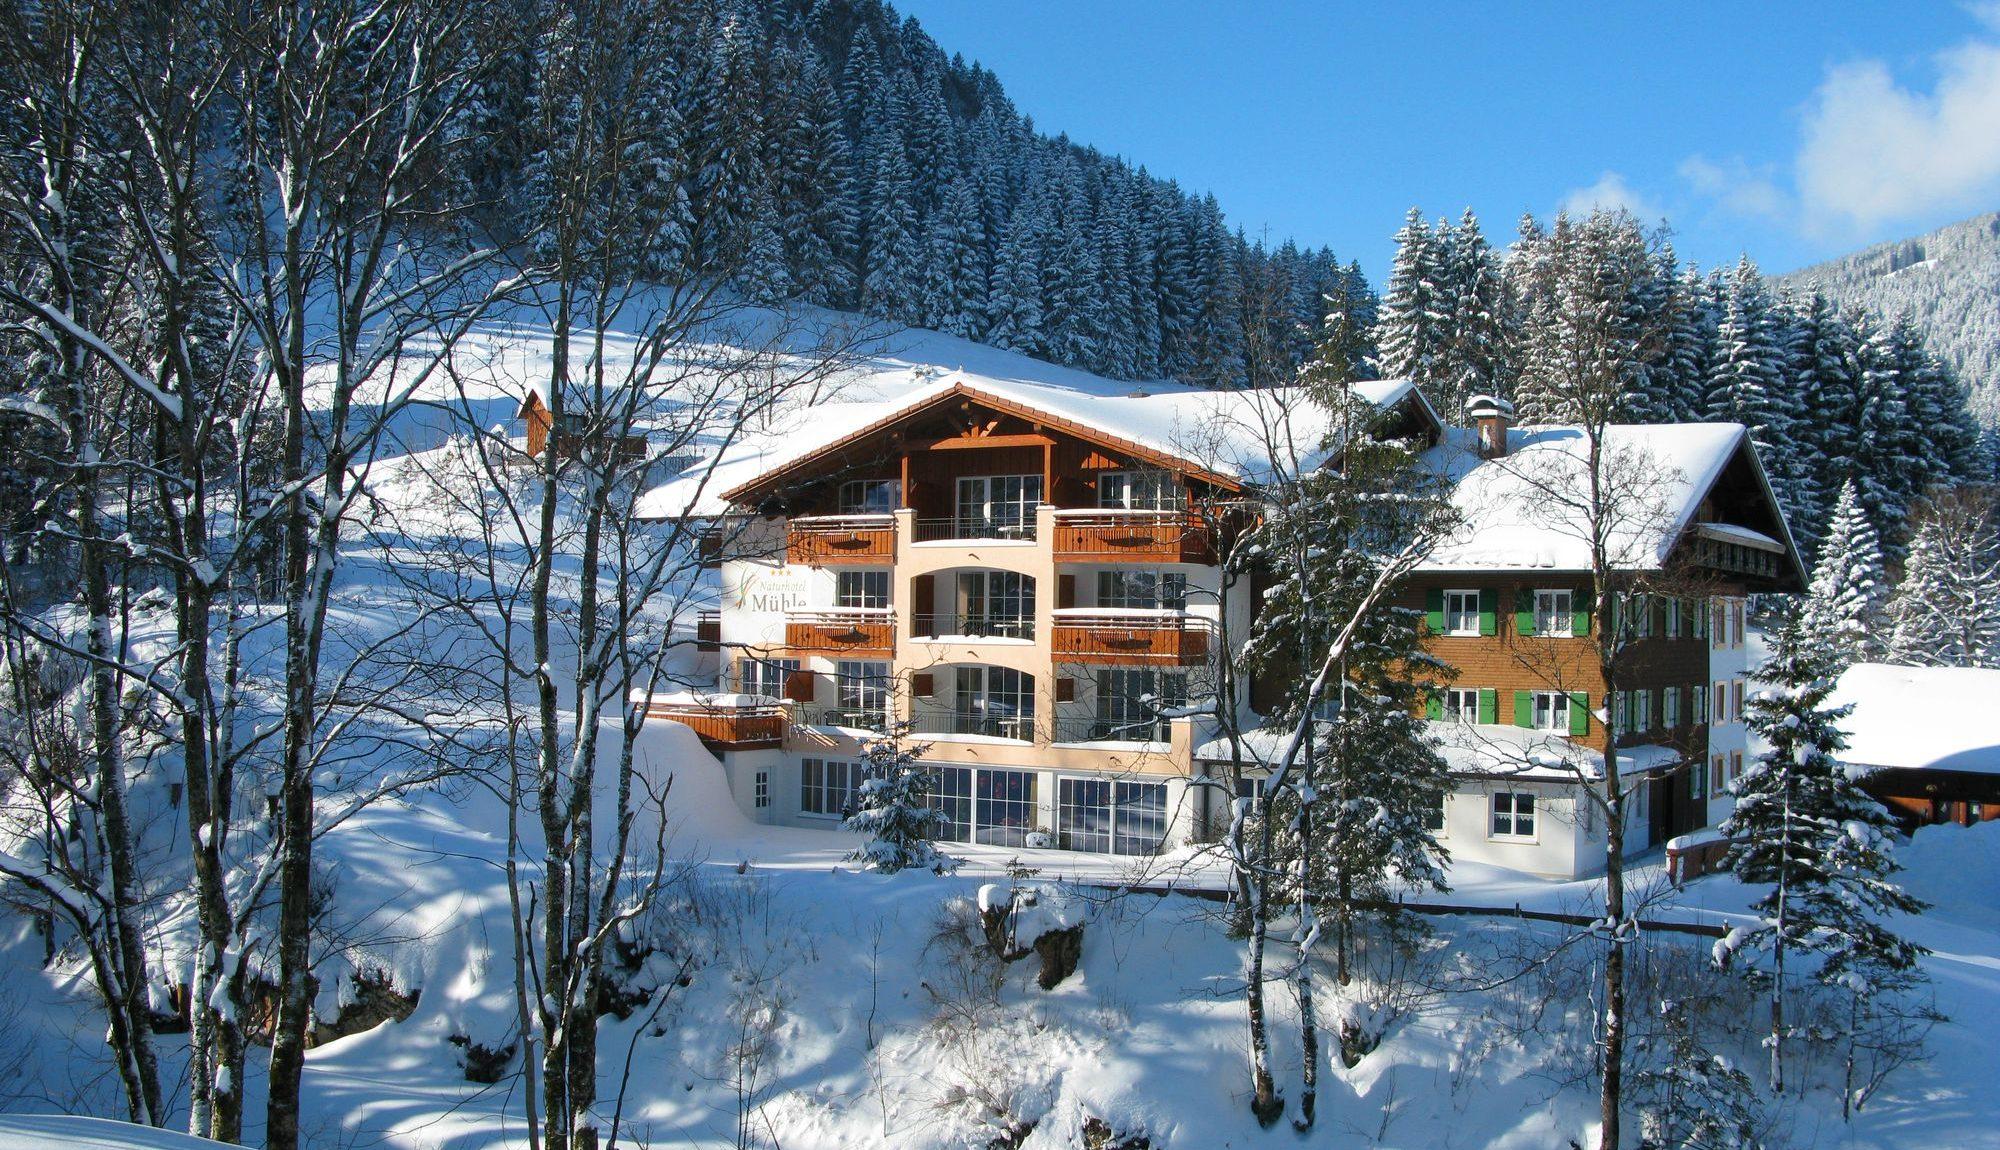 berghotel-muehle-winter-haus-ost